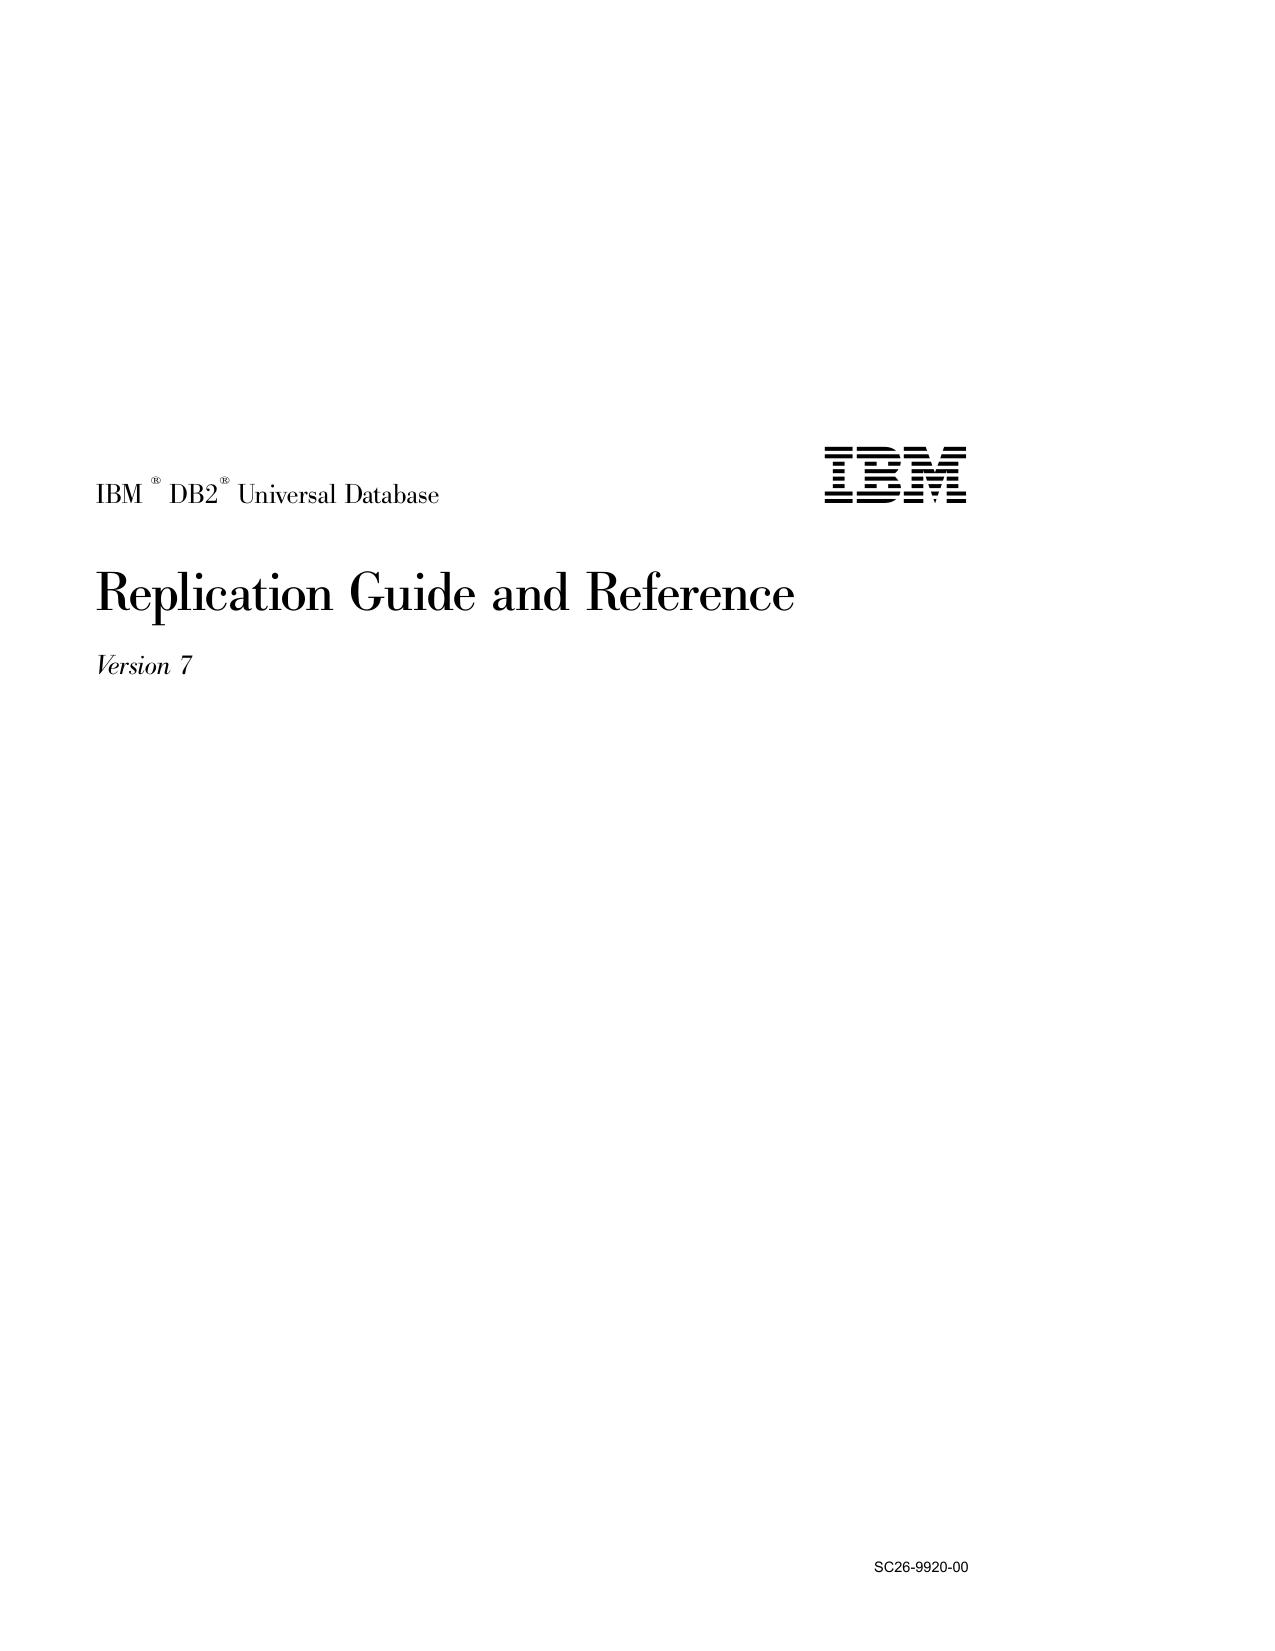 IBM DB2 Universal Database Replication Guide and | manualzz com